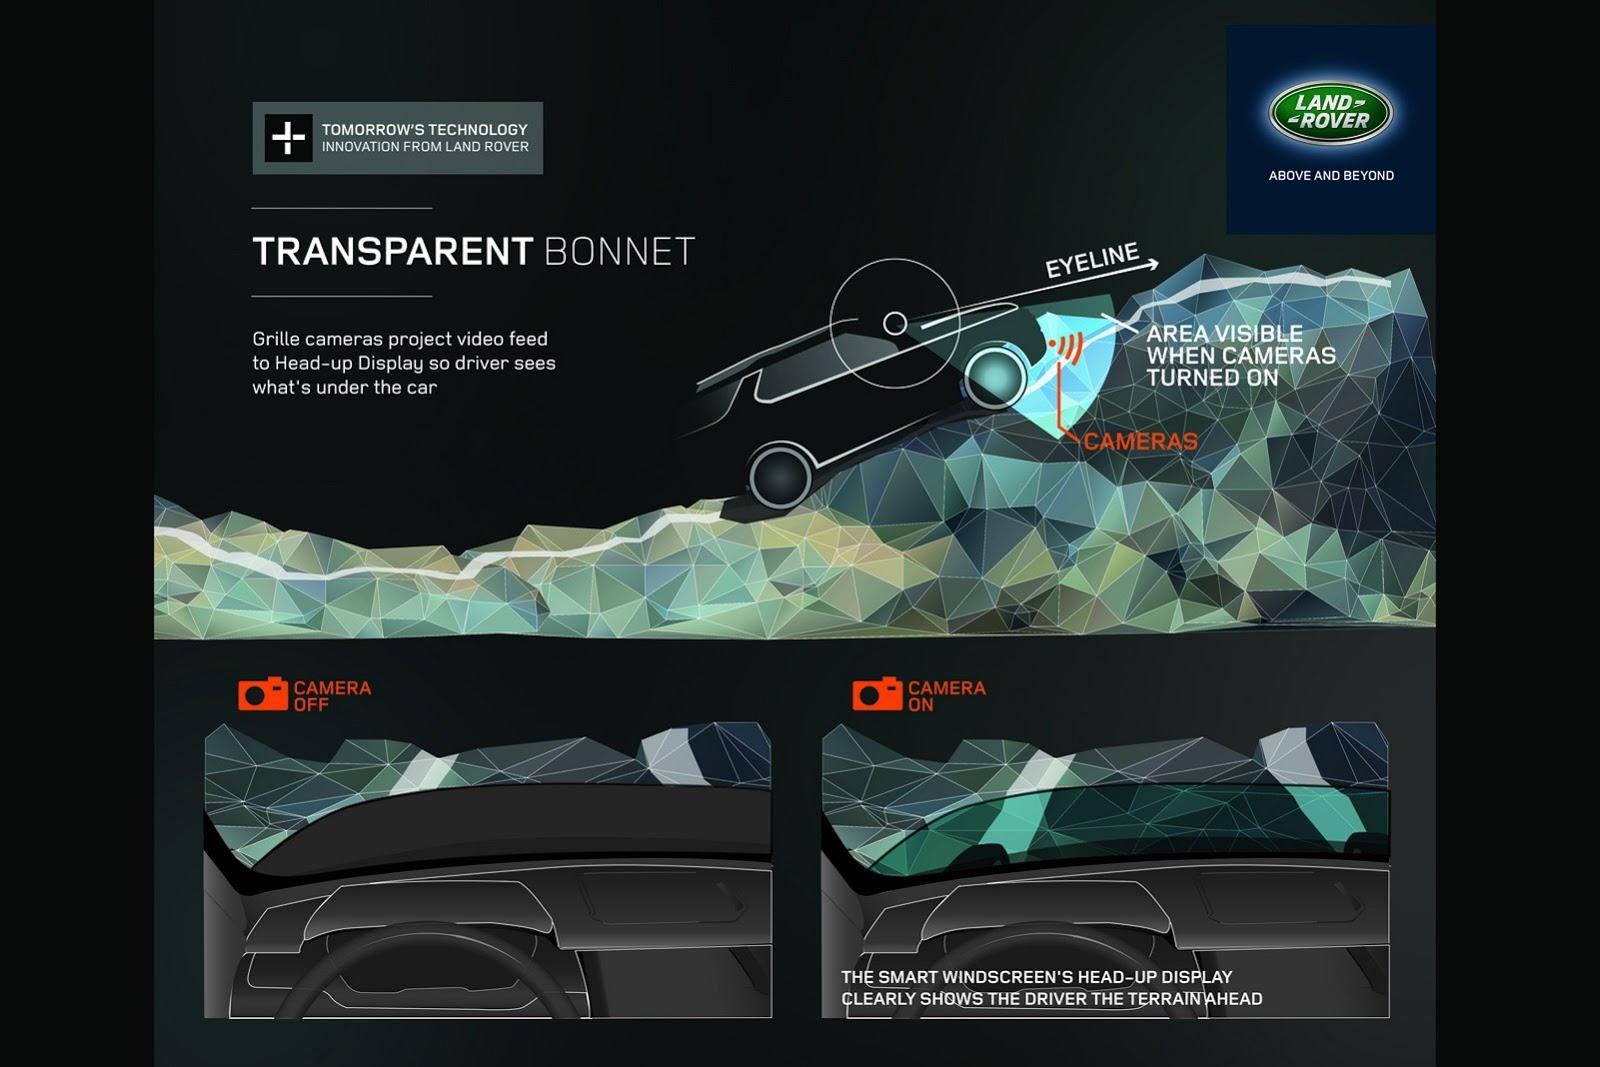 Land-Rover-Discovery-Vision-Transparent-Bonnet-1[3]